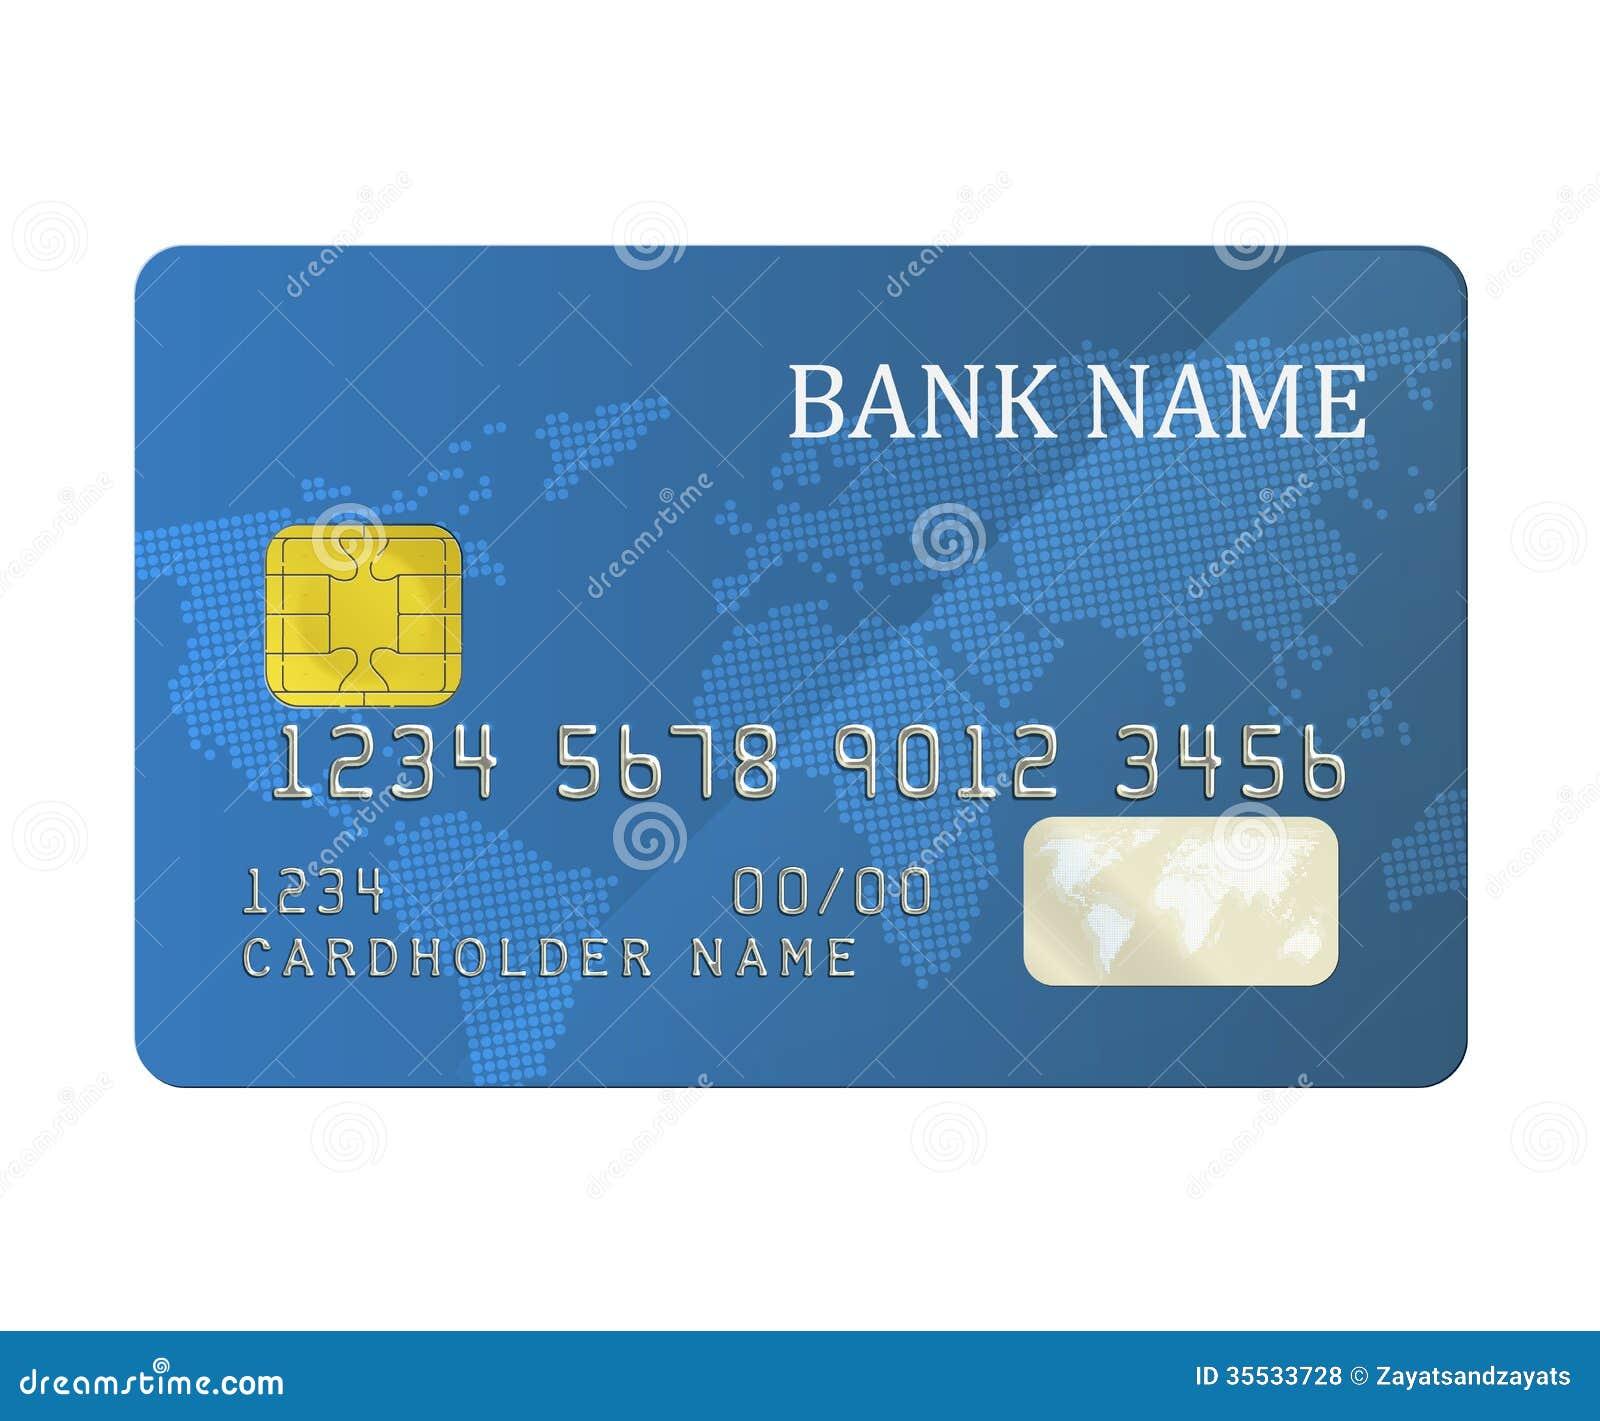 card bank: